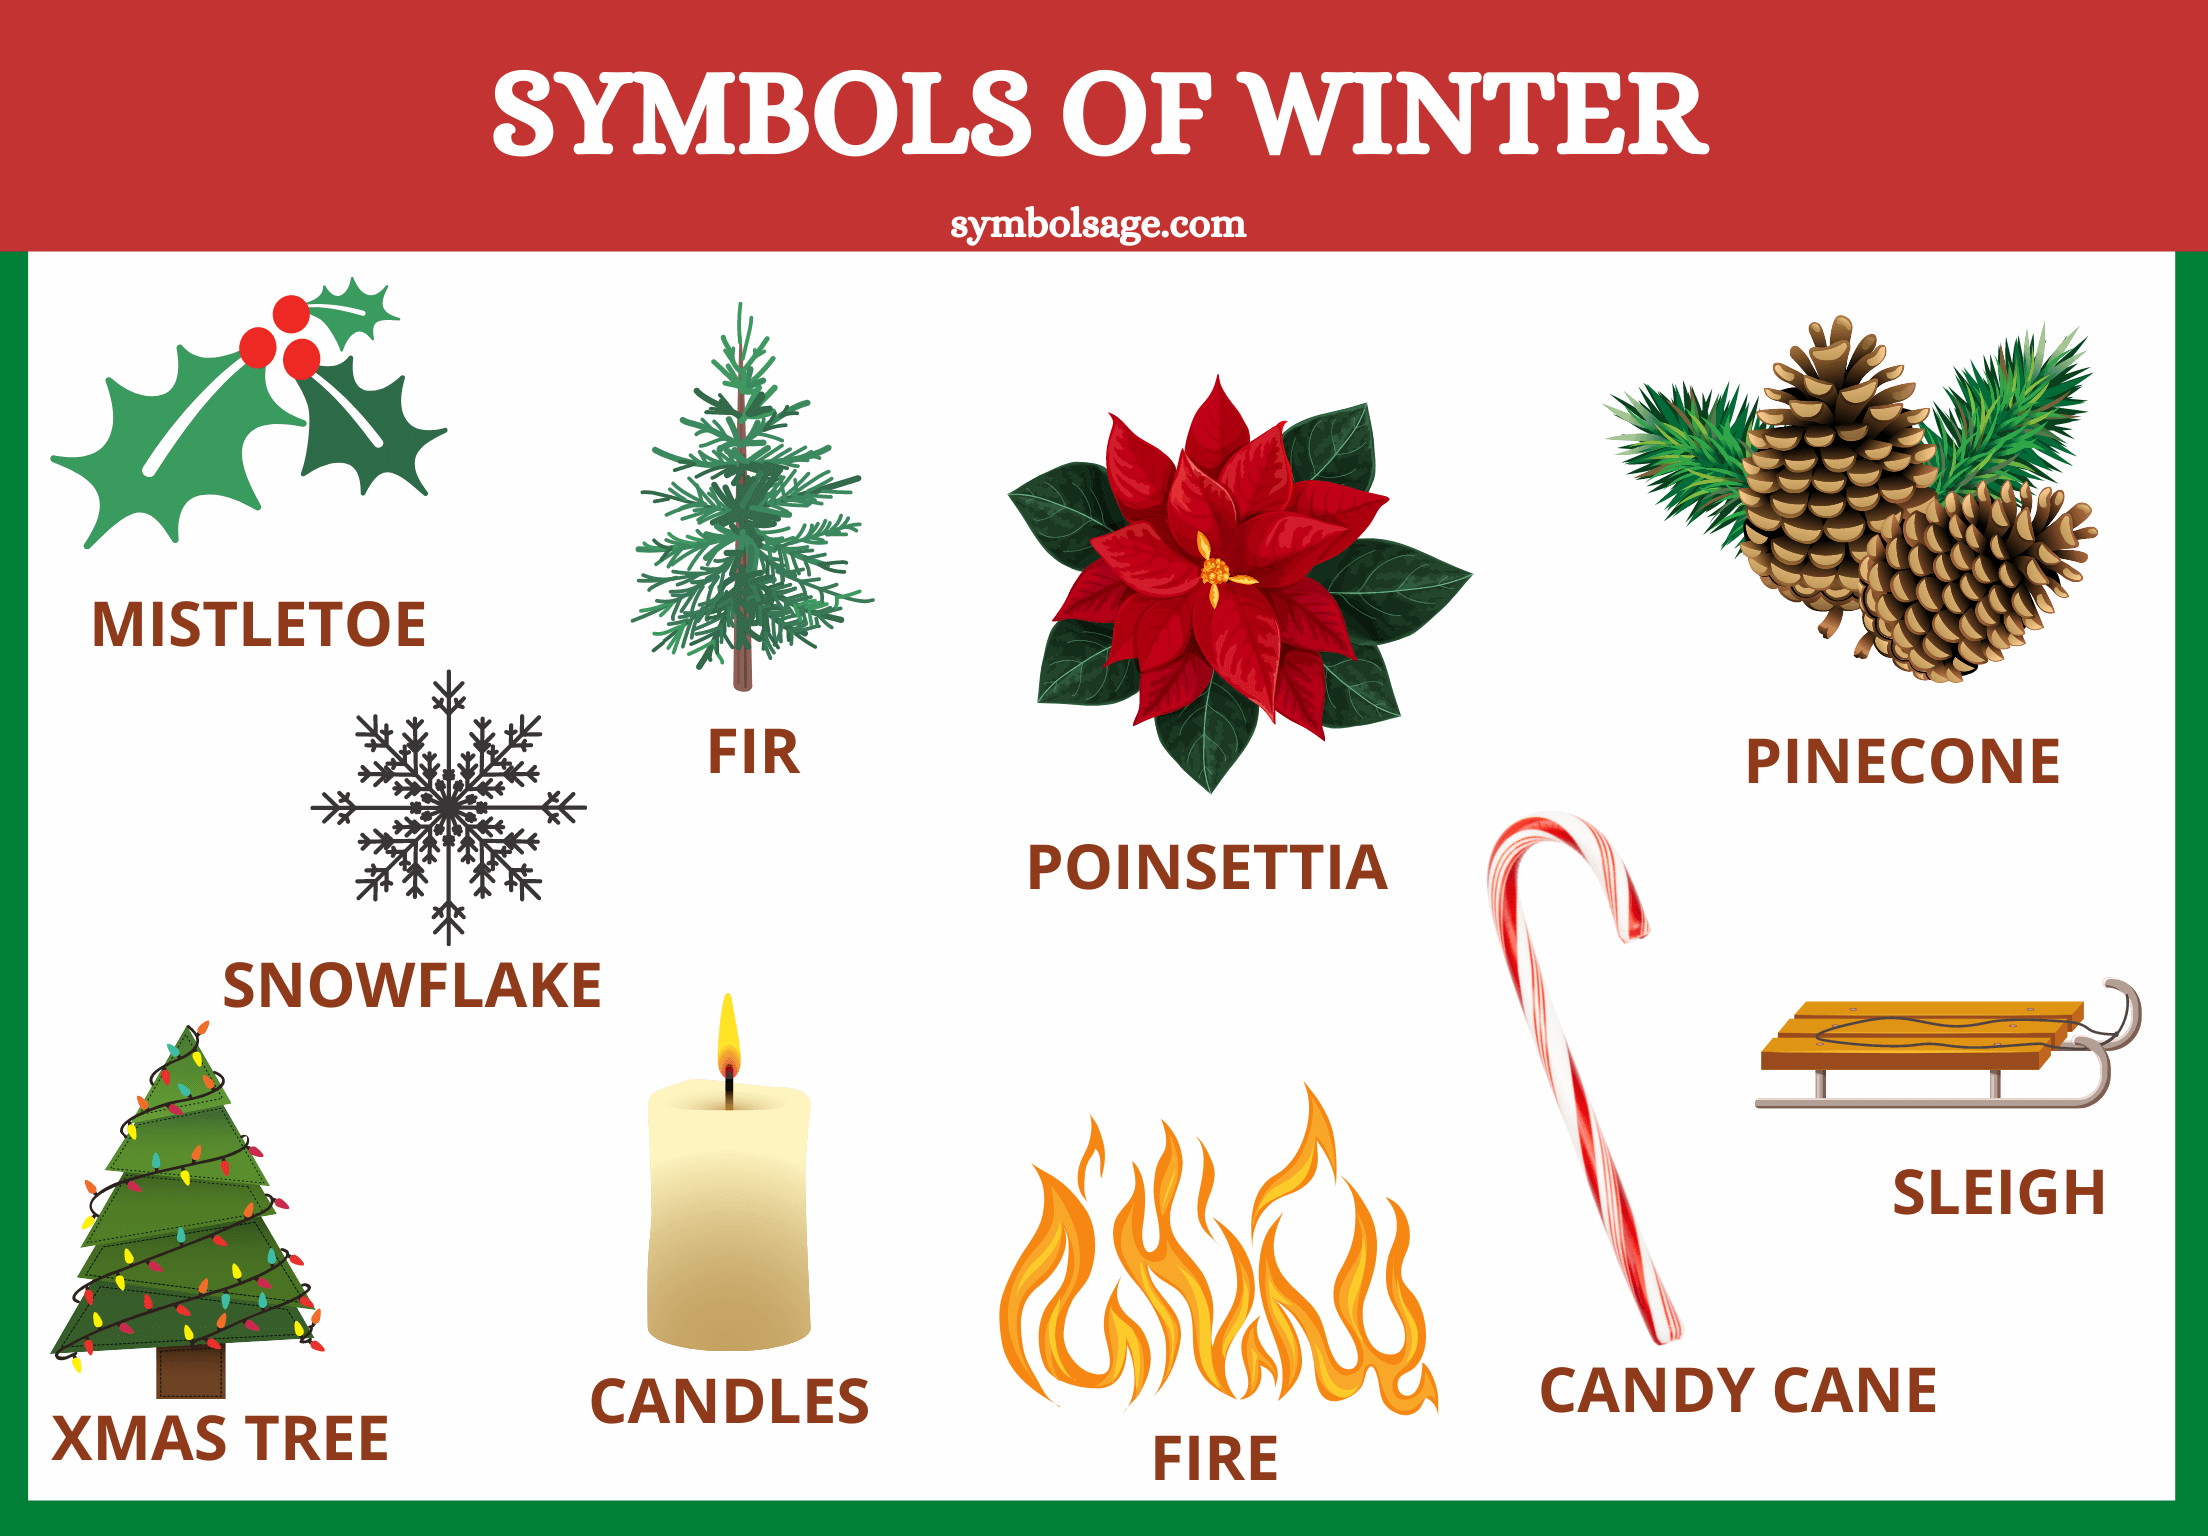 Symbols of winter